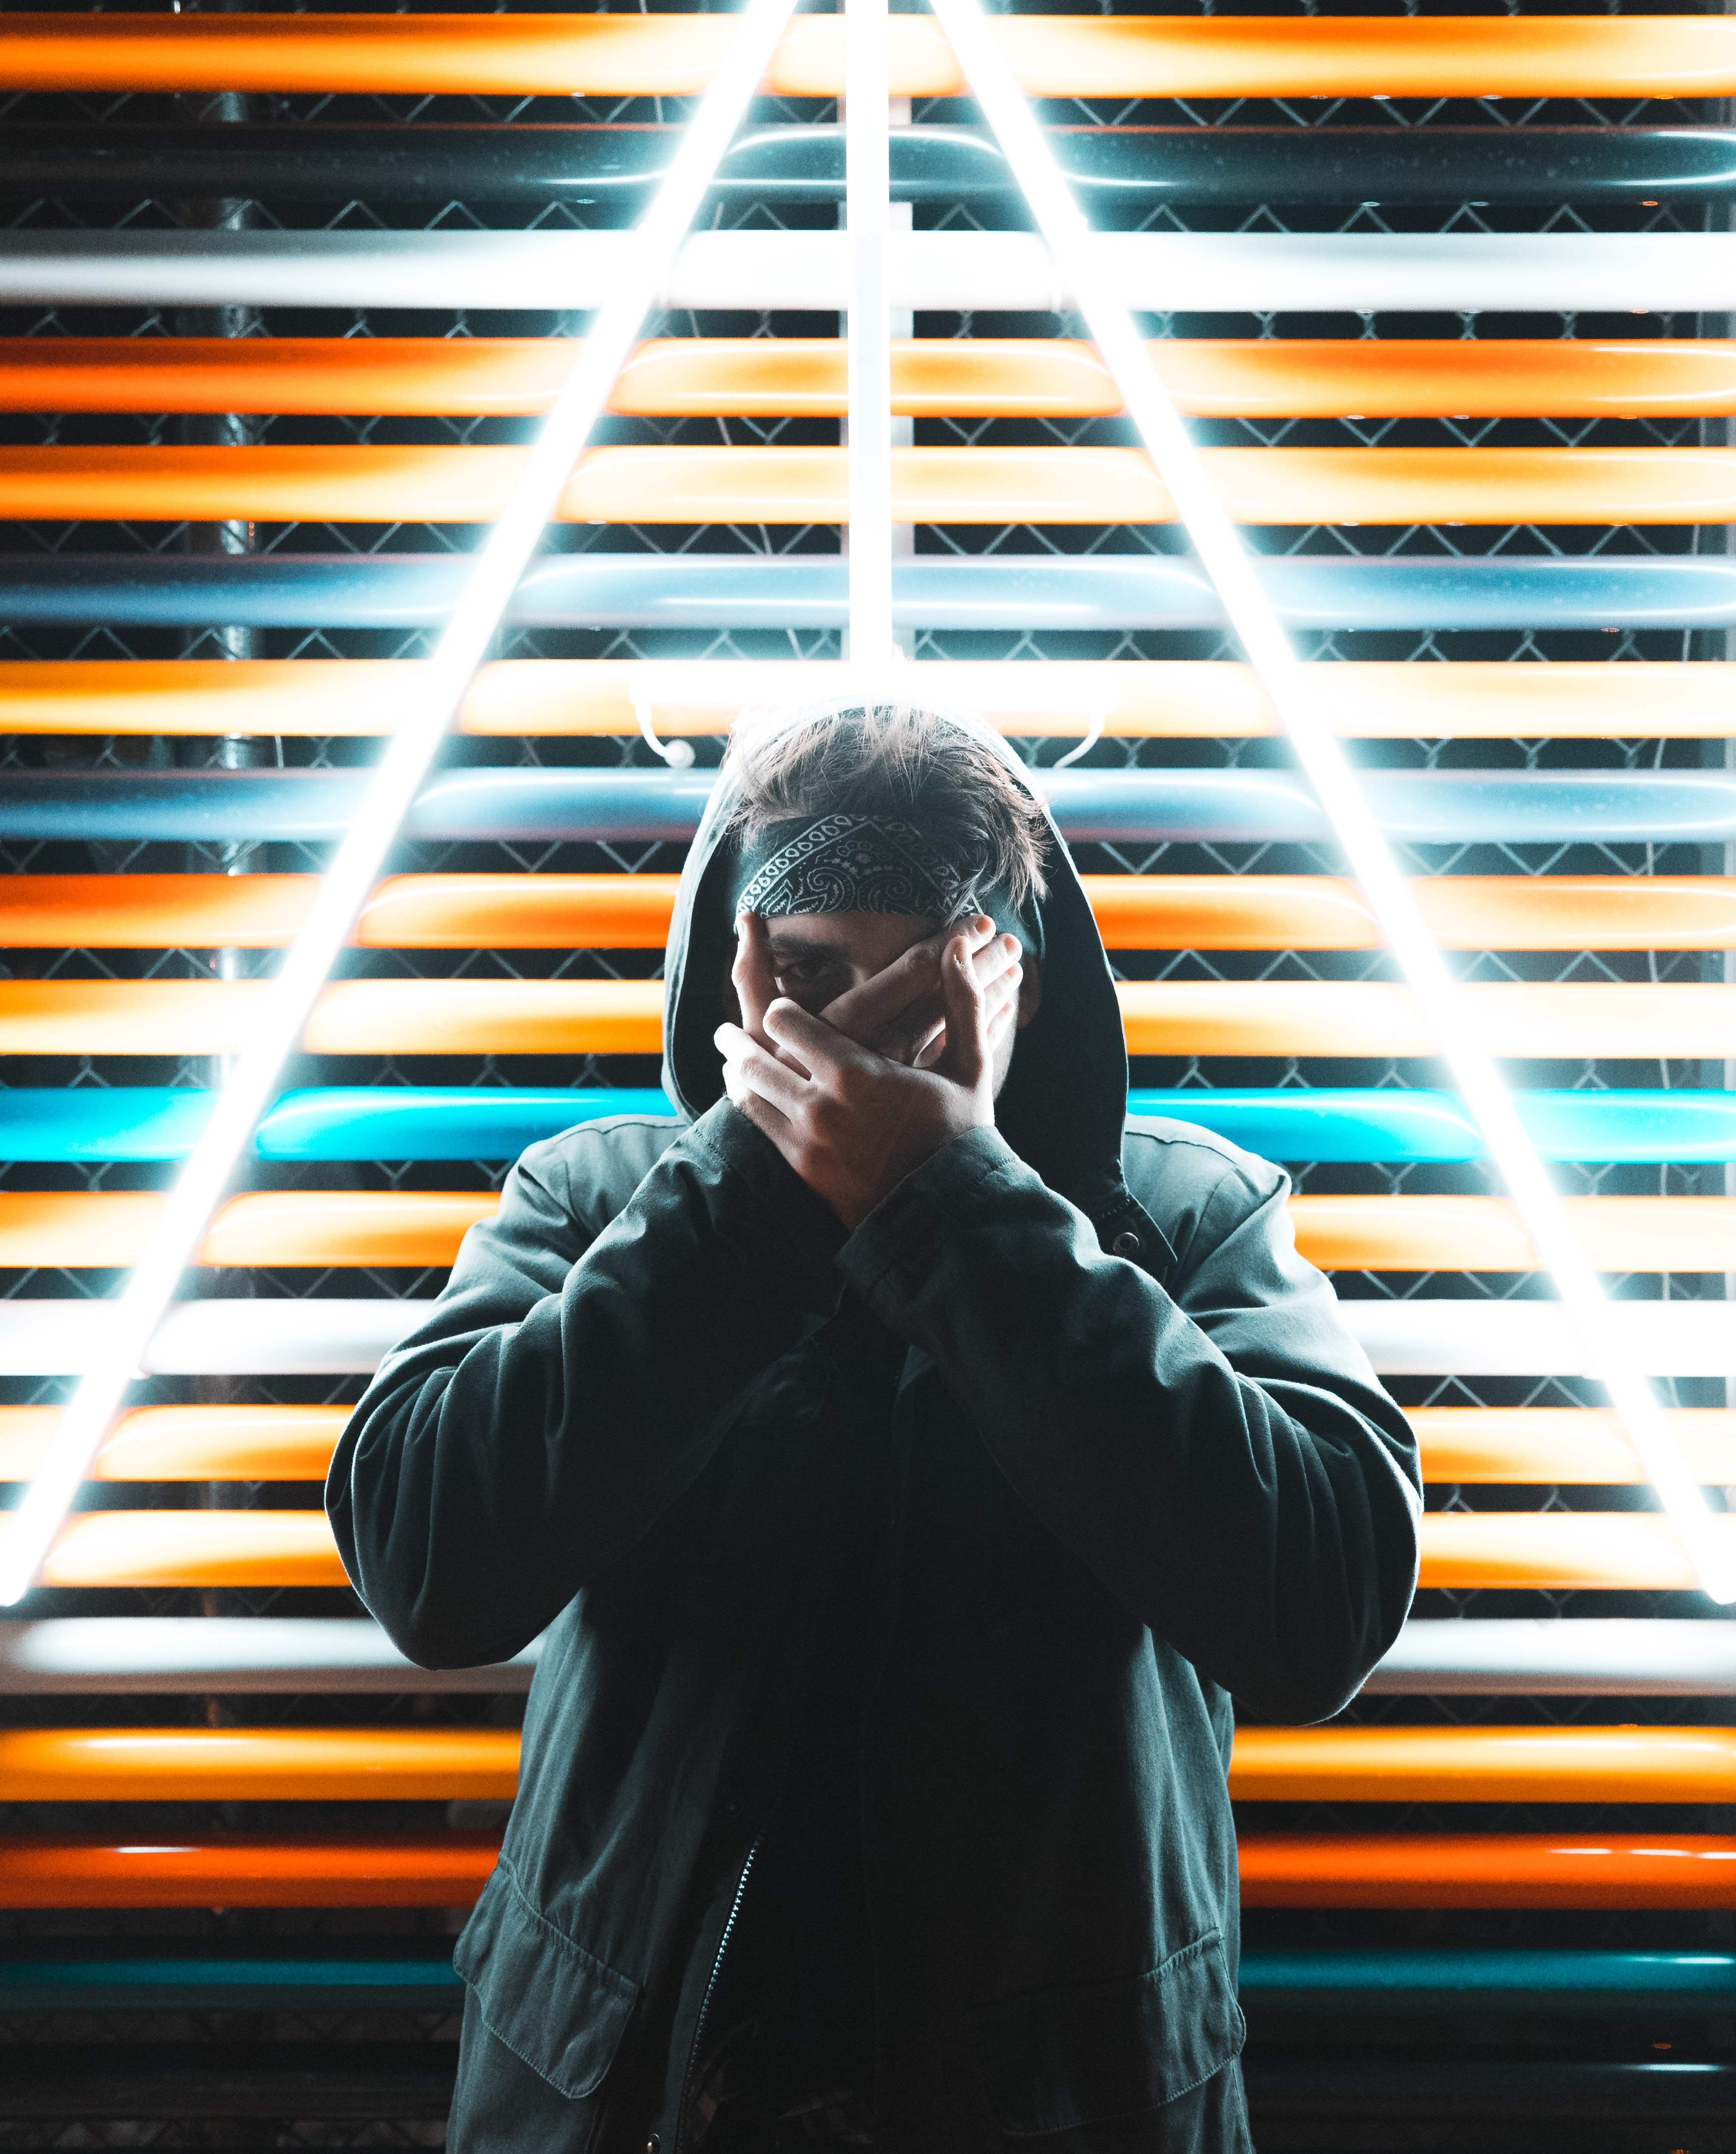 man in black coat standing in front of neon signage